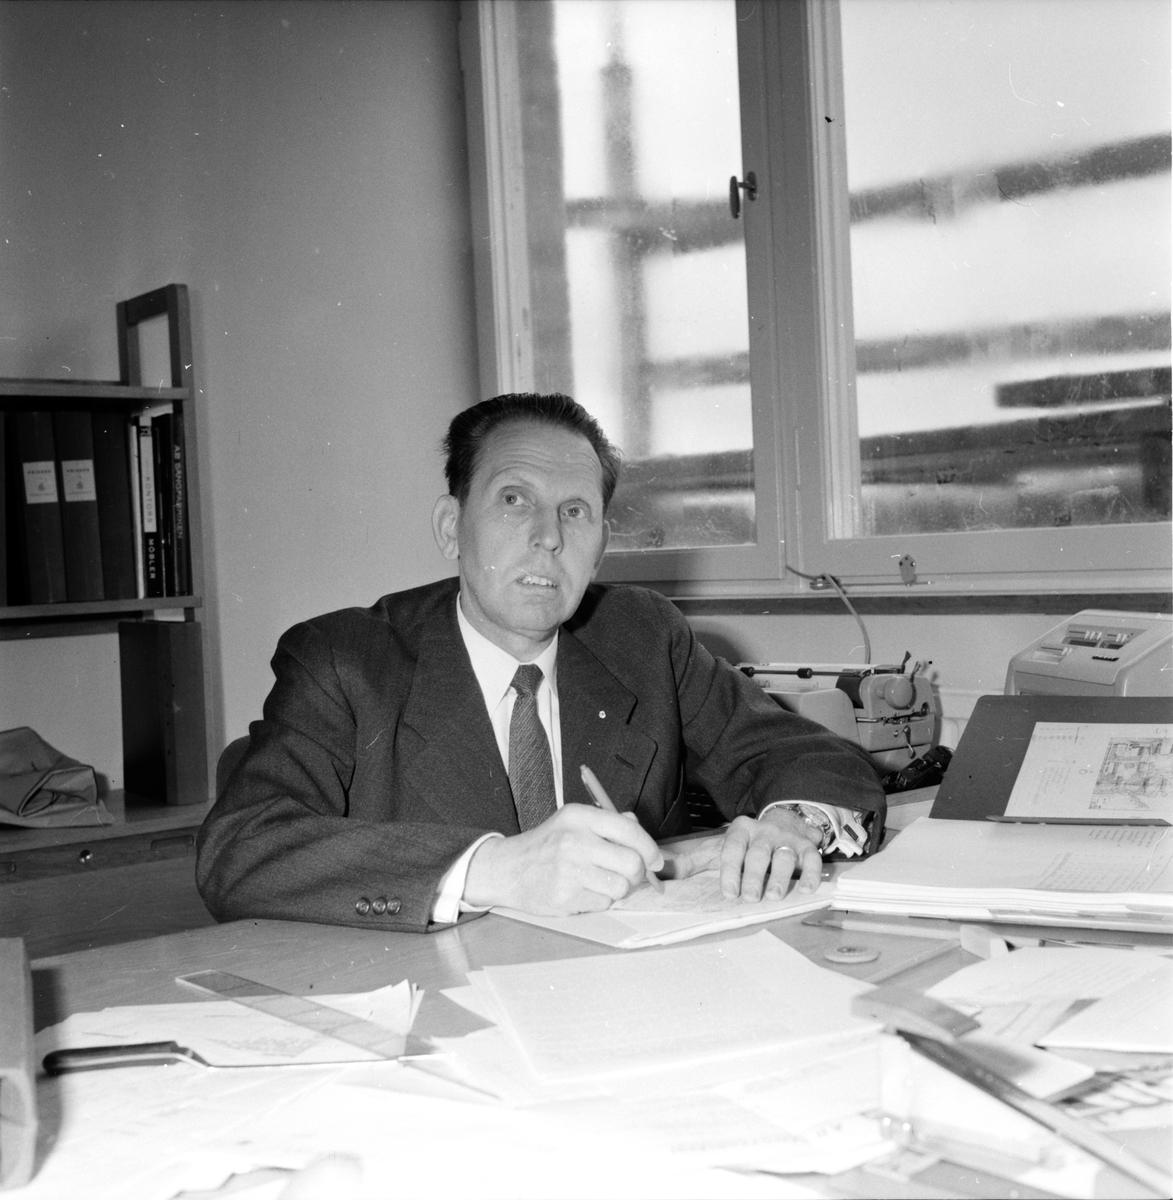 Mentalsjukhuset, Int. John Nilsson, 23 Maj 1962